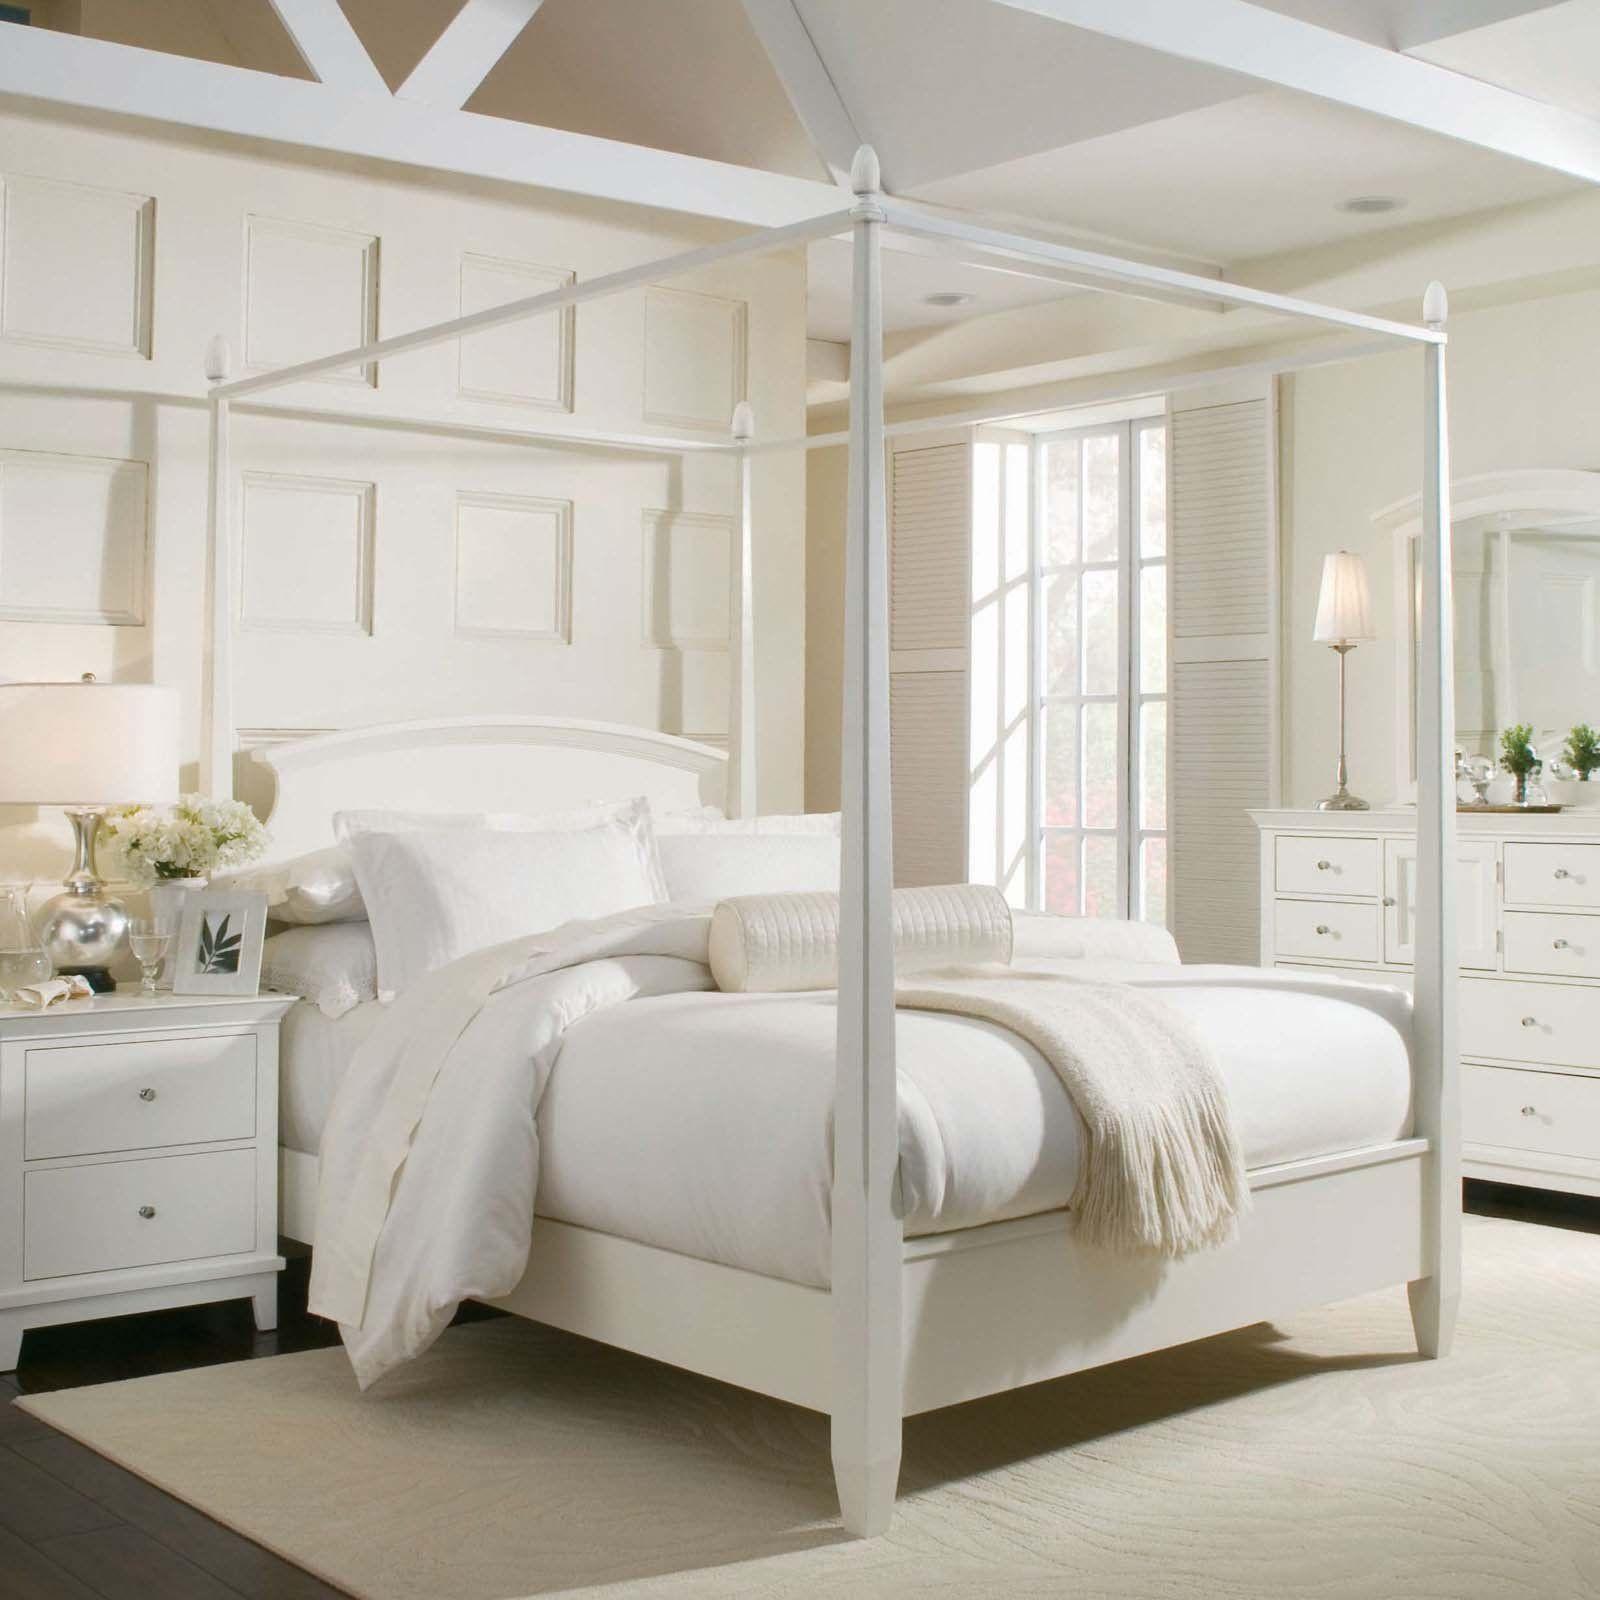 32. Stylish Canopy Bedroom Sets